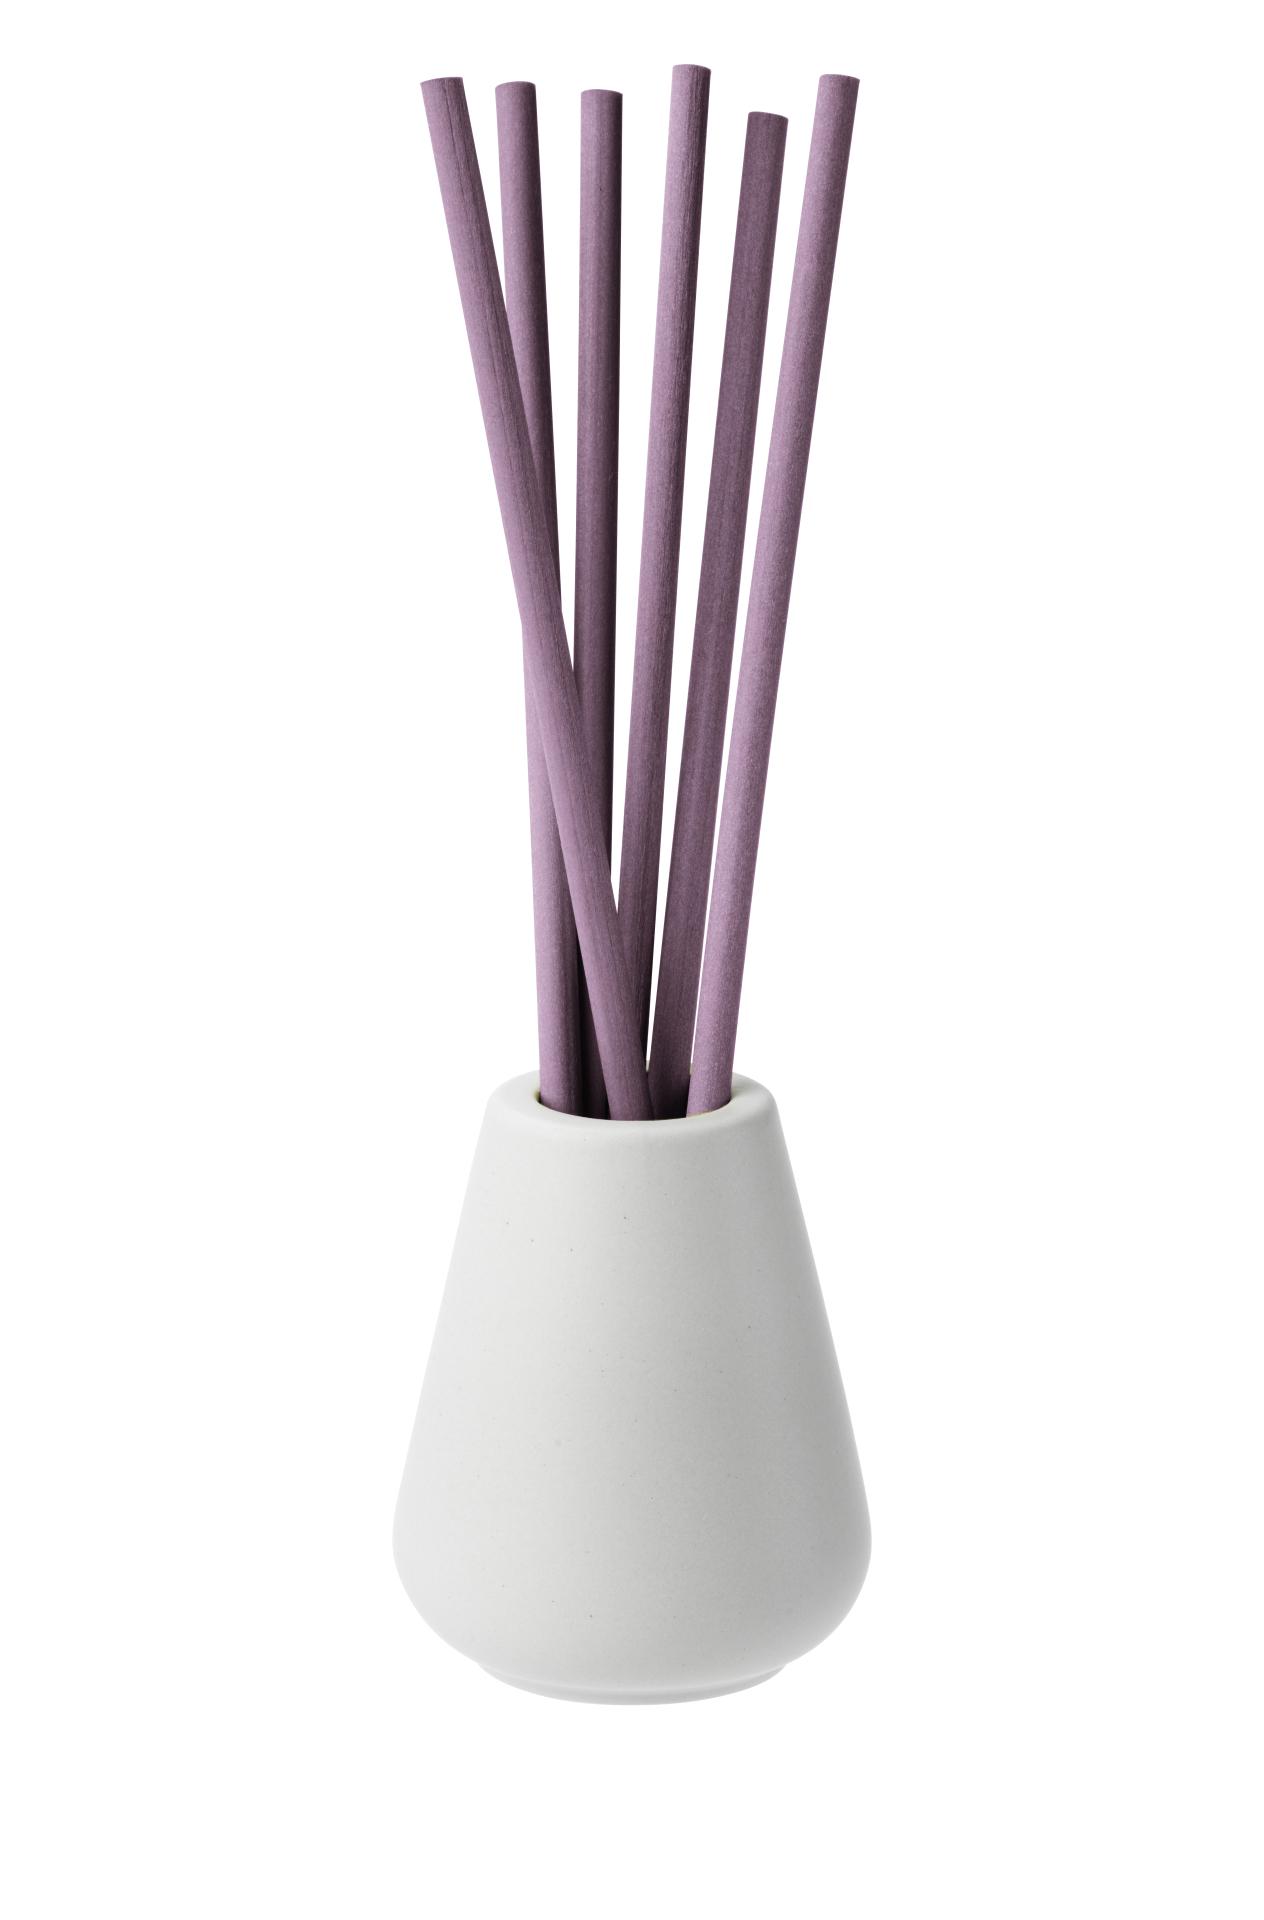 NJUTNING花瓶及香氛枝條